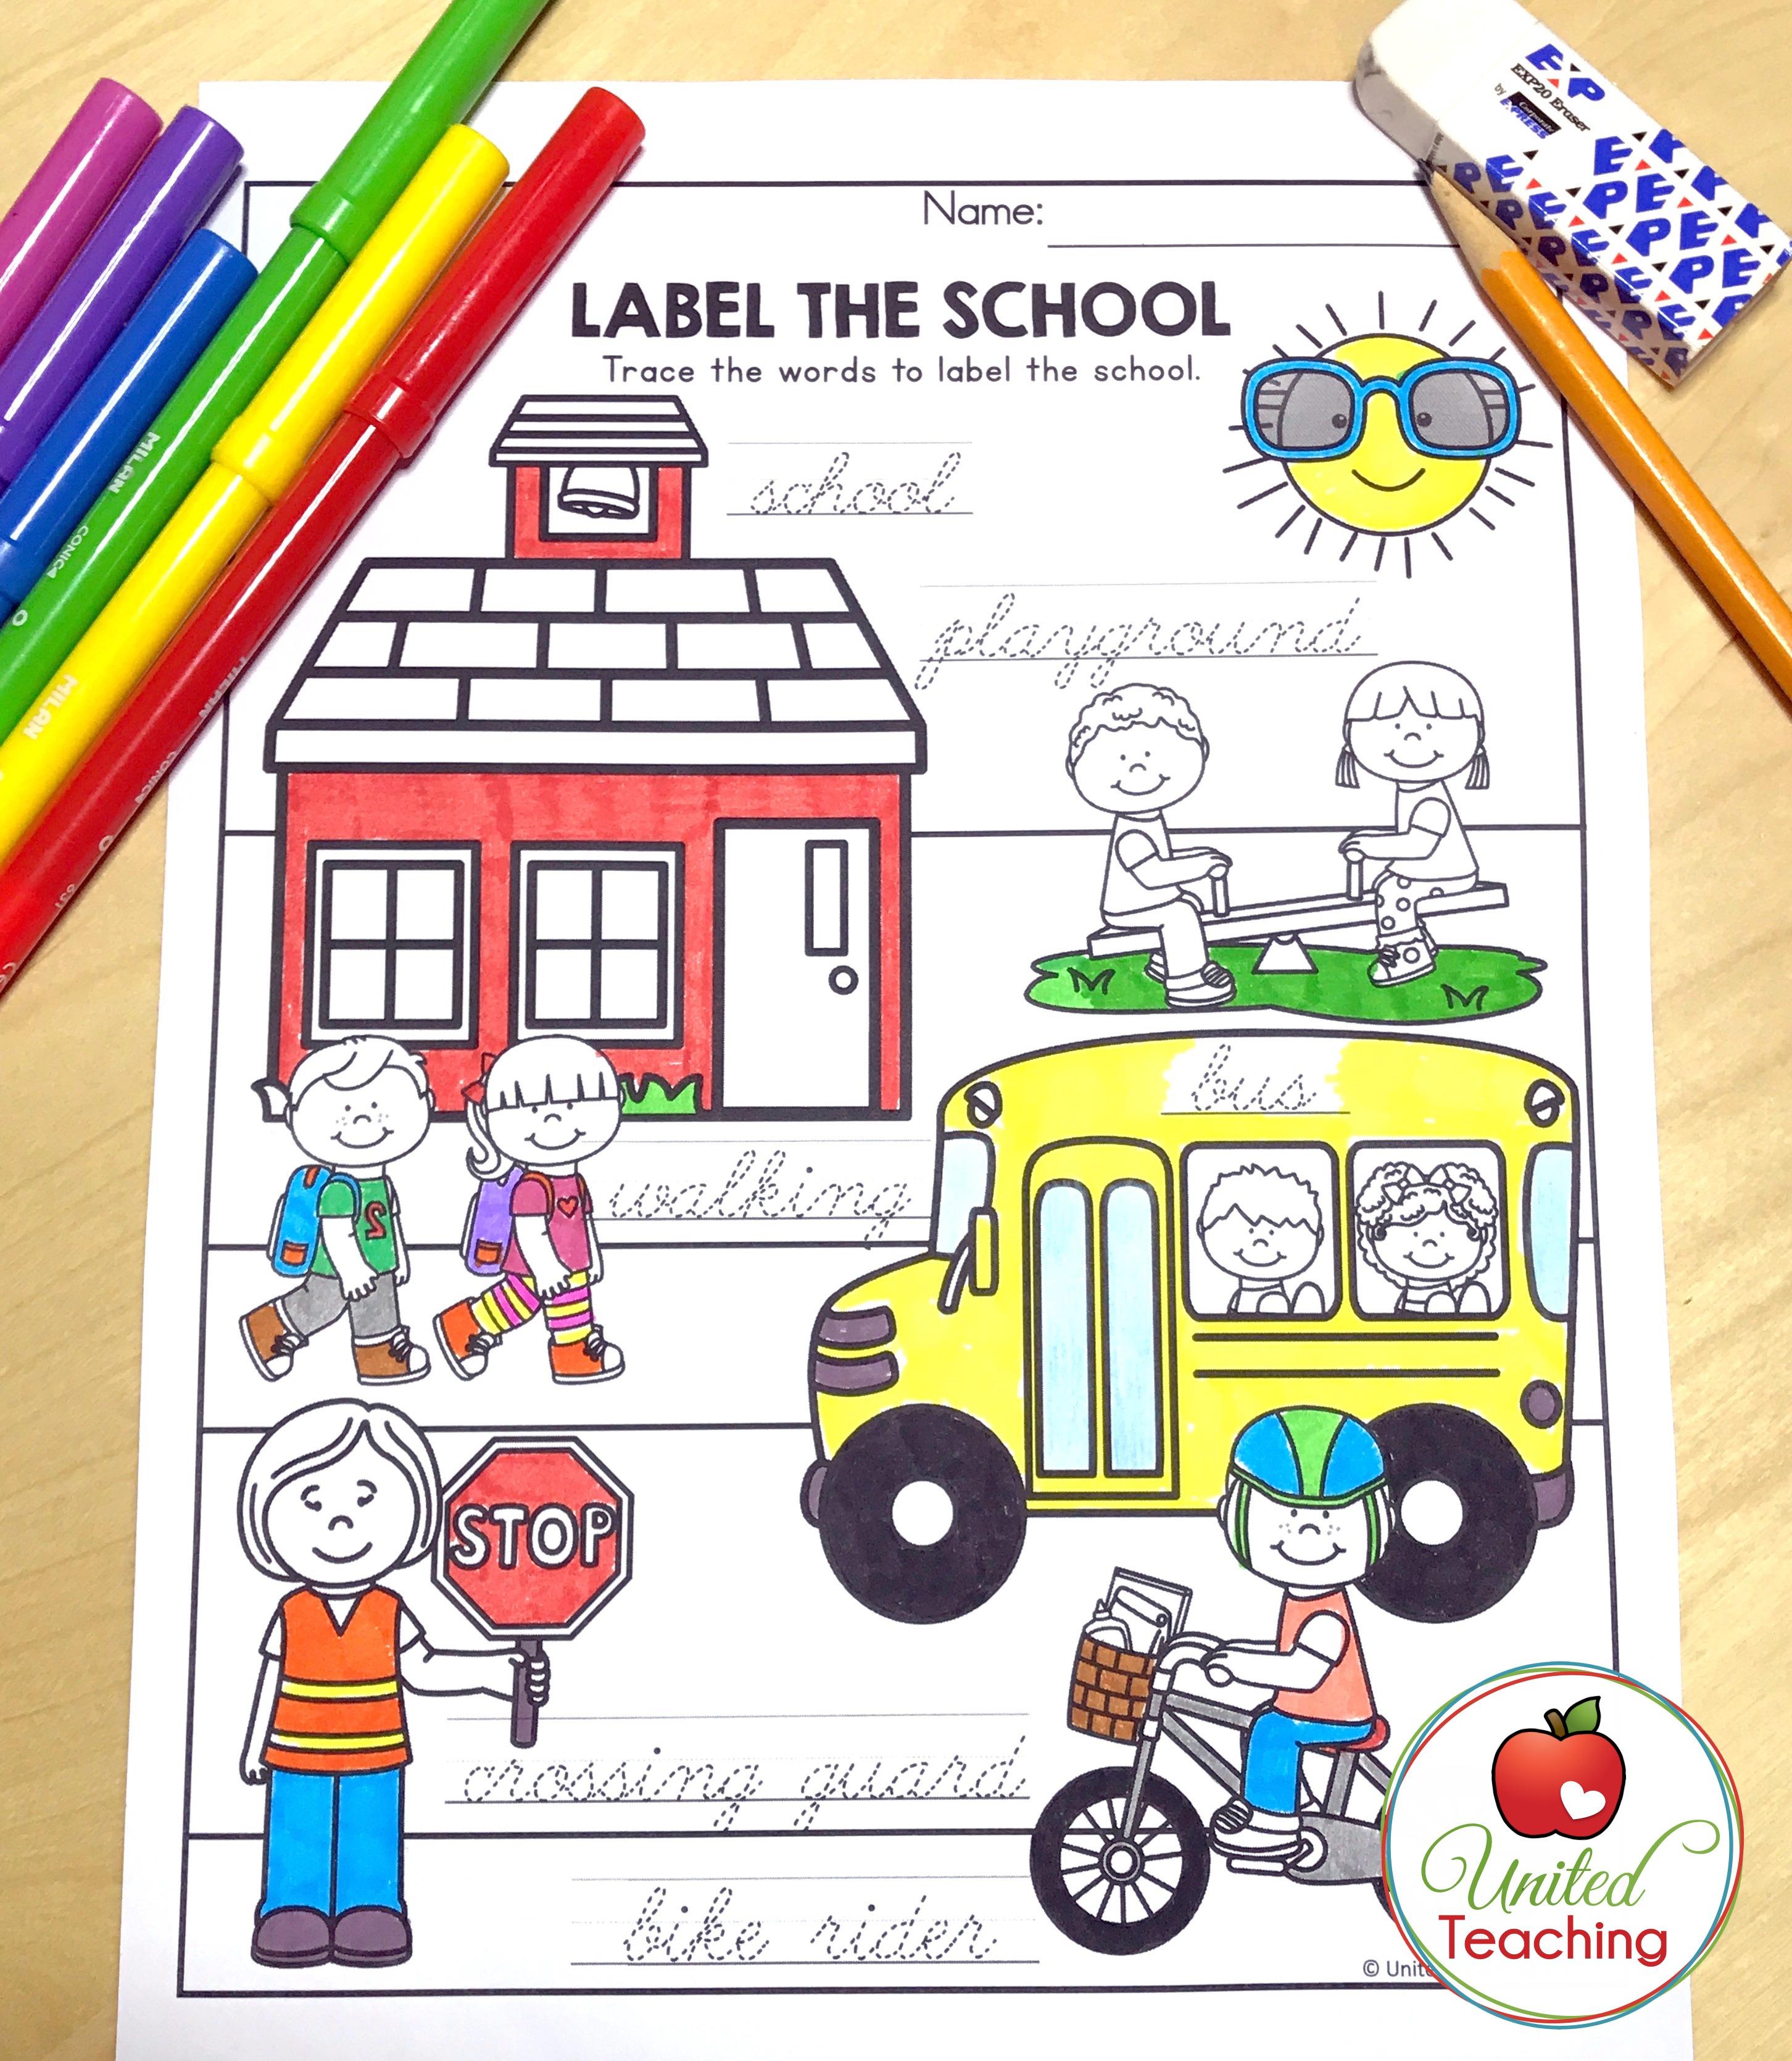 Label the School